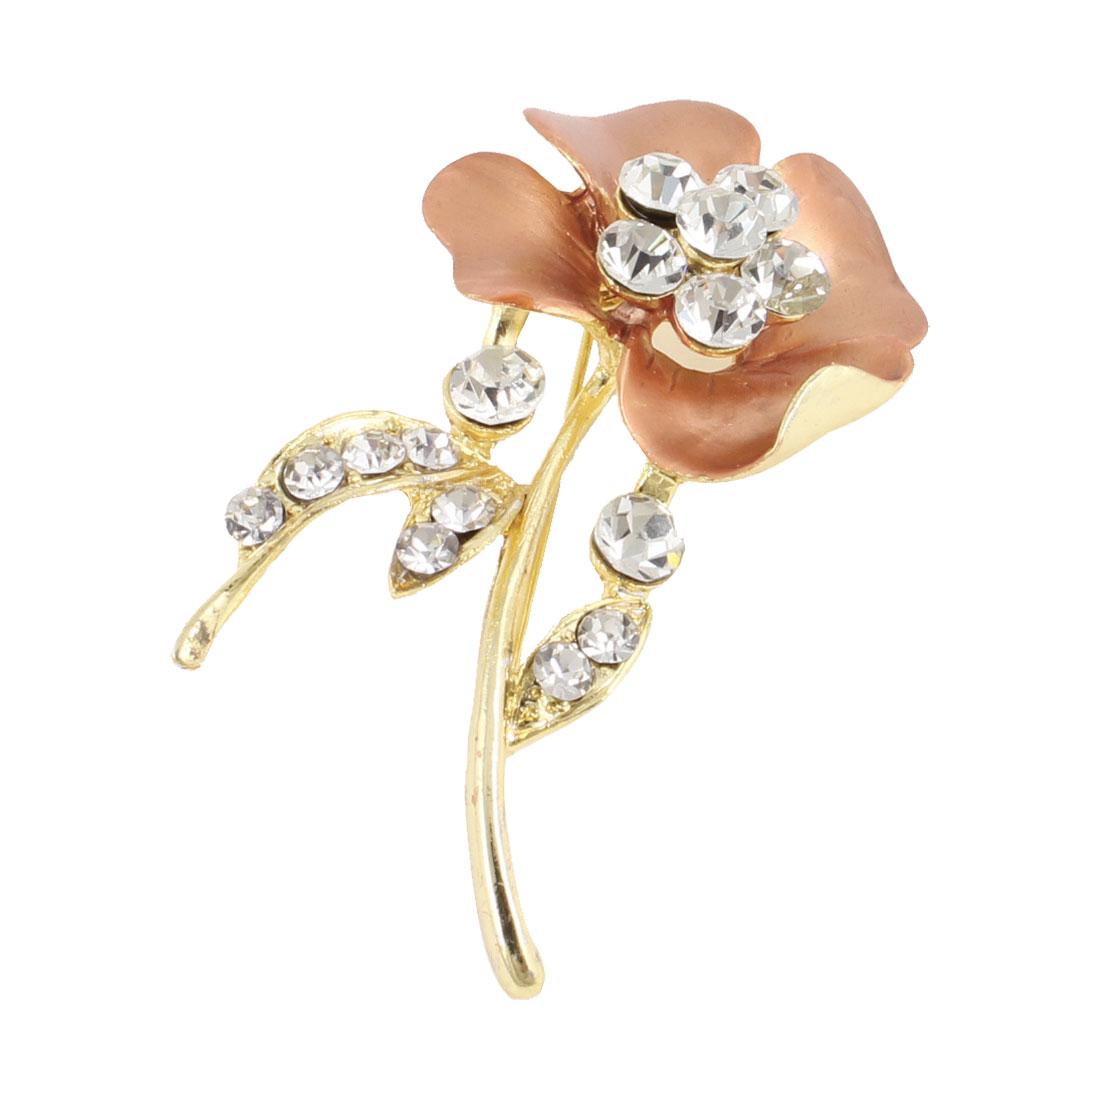 Ladies Copper Tone Petal Shiny Rhinestones Decor Breast Breastpin Pin Brooch